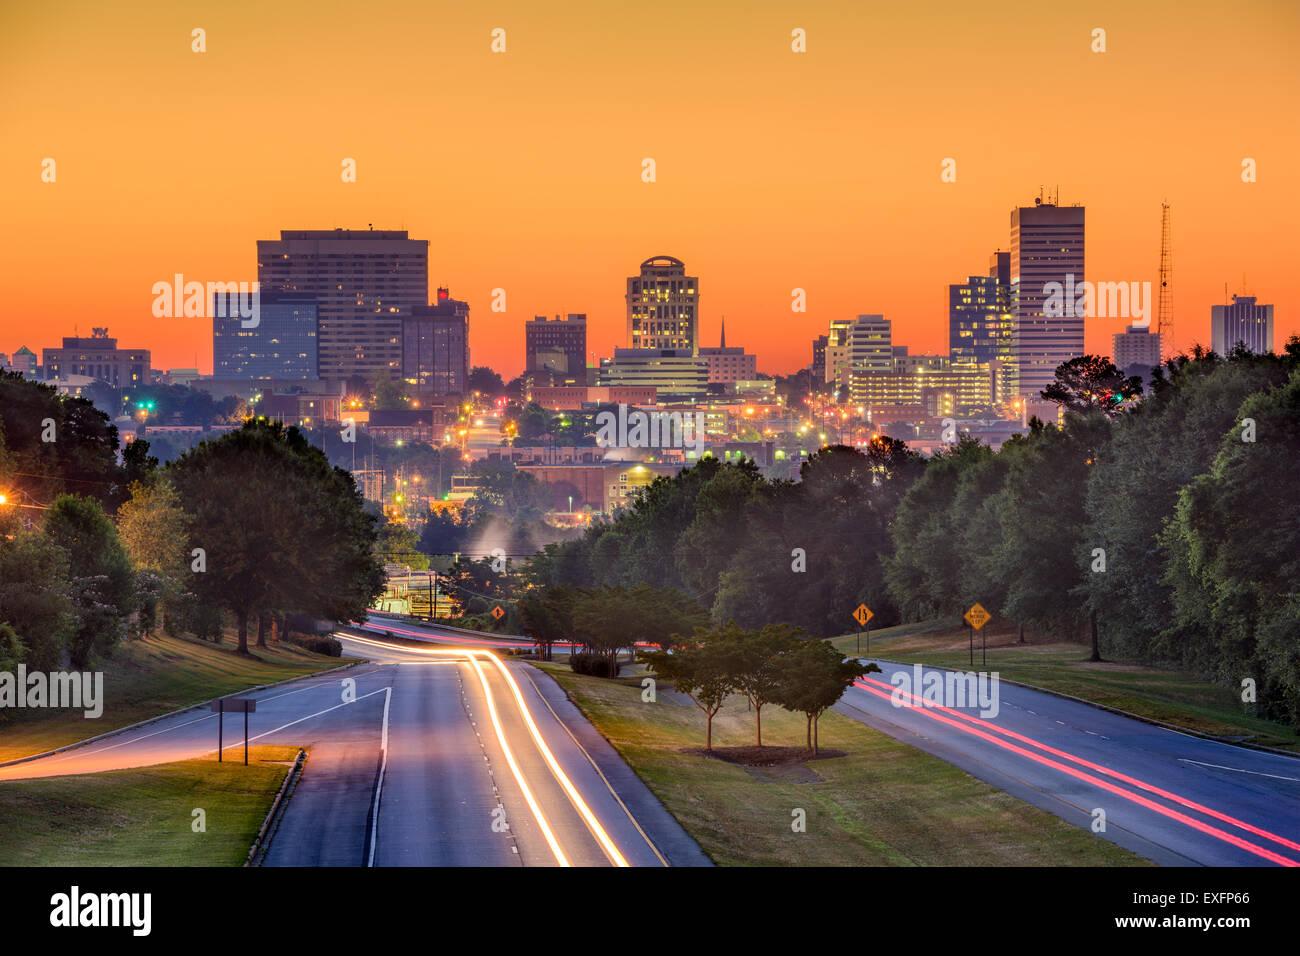 Skyline of downtown Columbia, South Carolina from above Jarvis Klapman Blvd. - Stock Image